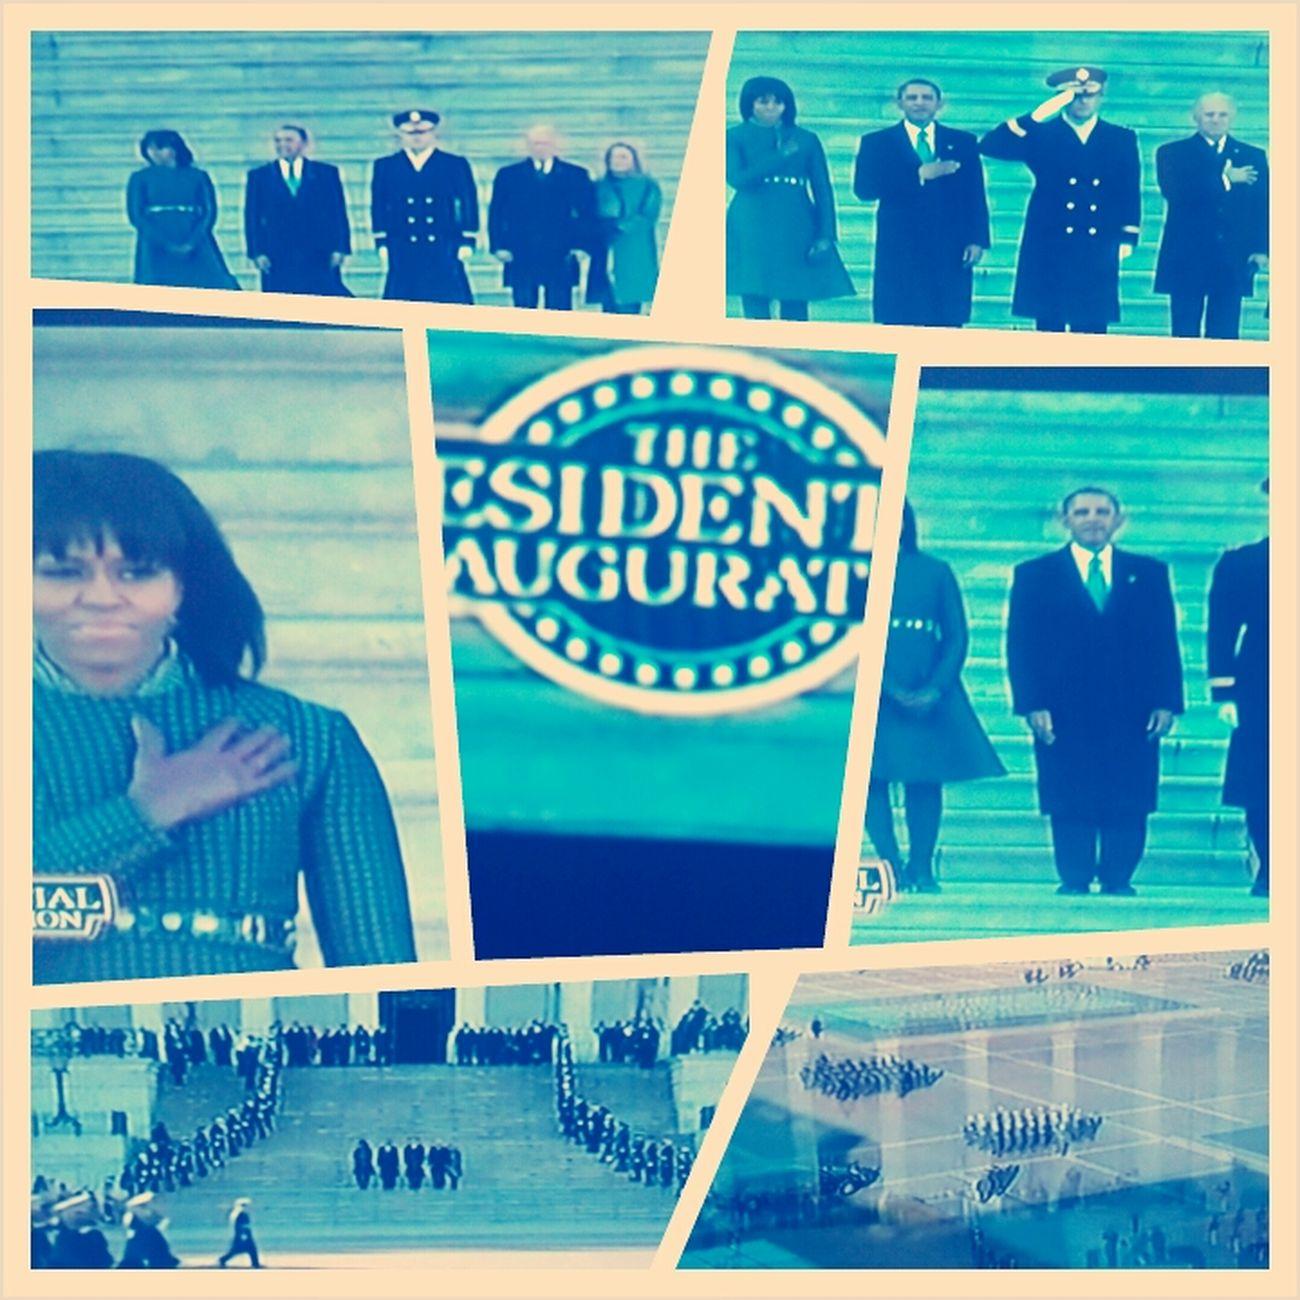 Watching The Inauguration